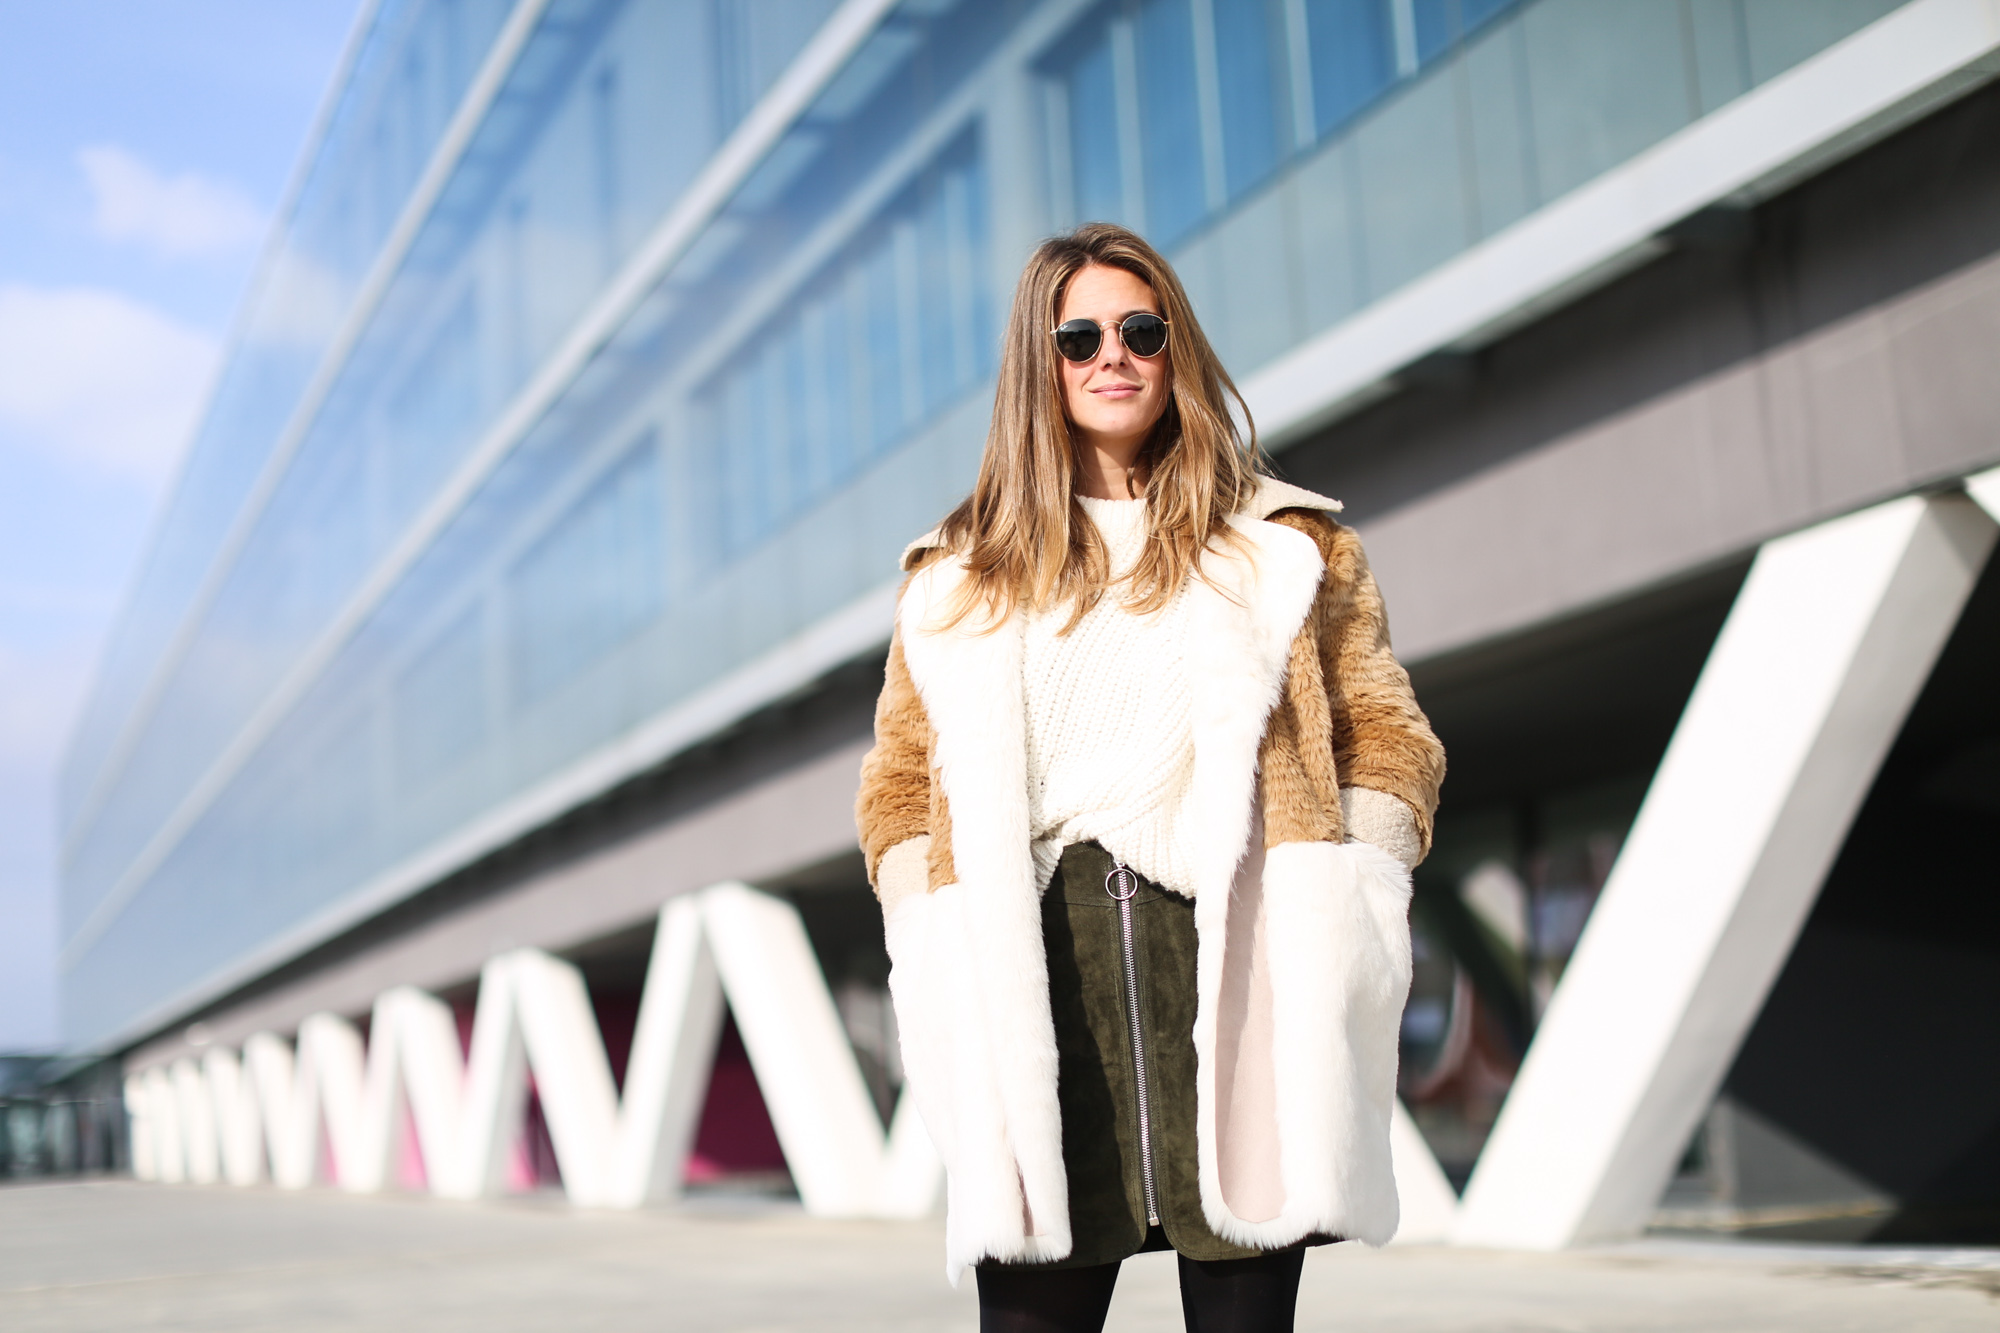 Clochet_streetstyle_fashionblogger_asosfauxfurcoat_minifaldaantezara_botinespieldorados-4